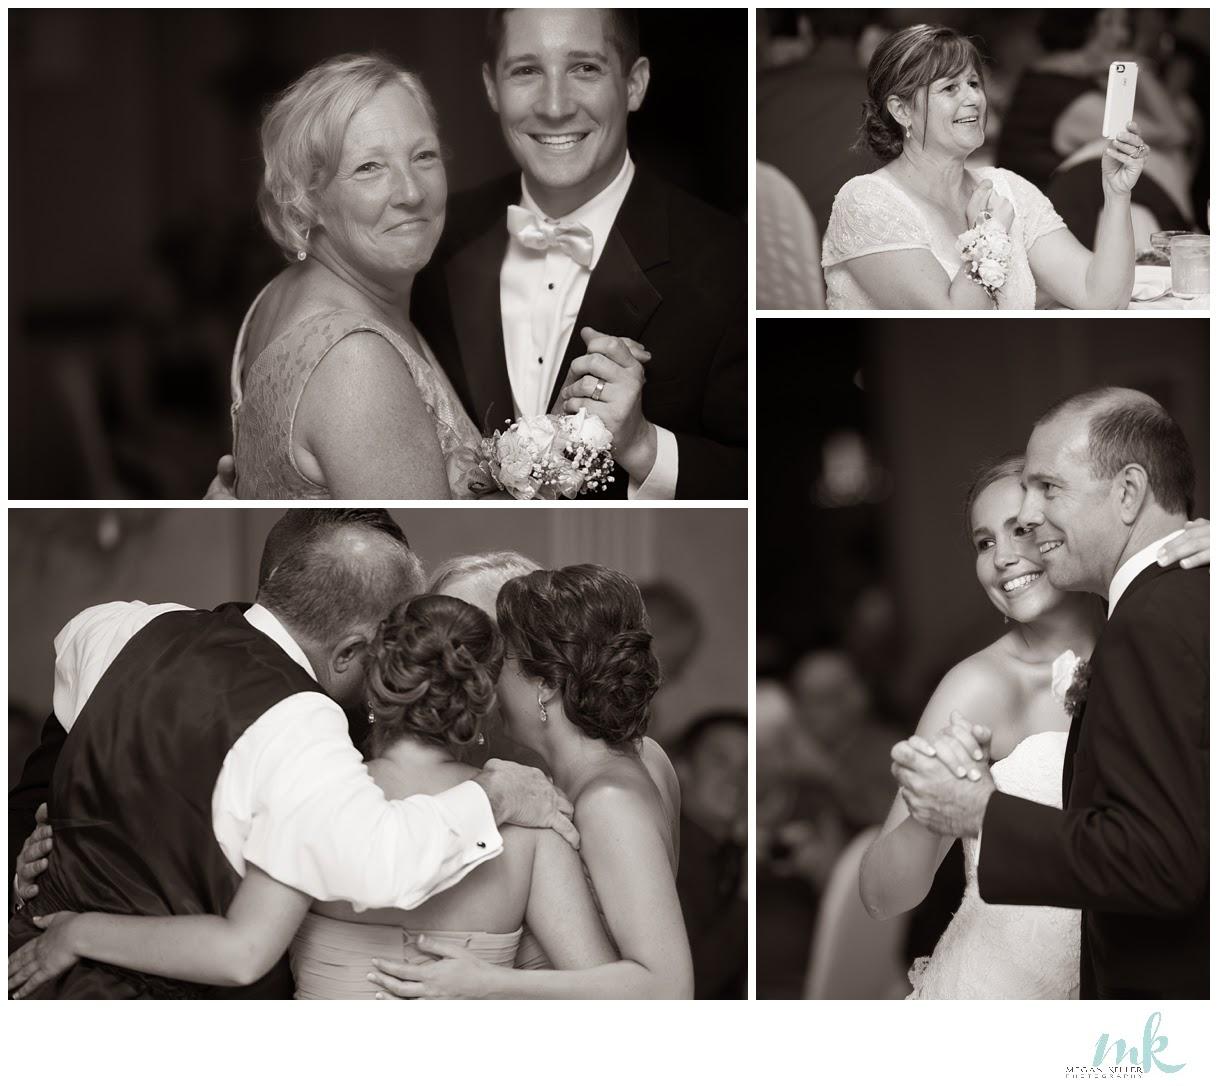 Danielle and Dan's wedding Danielle and Dan's wedding 2014 07 16 0025